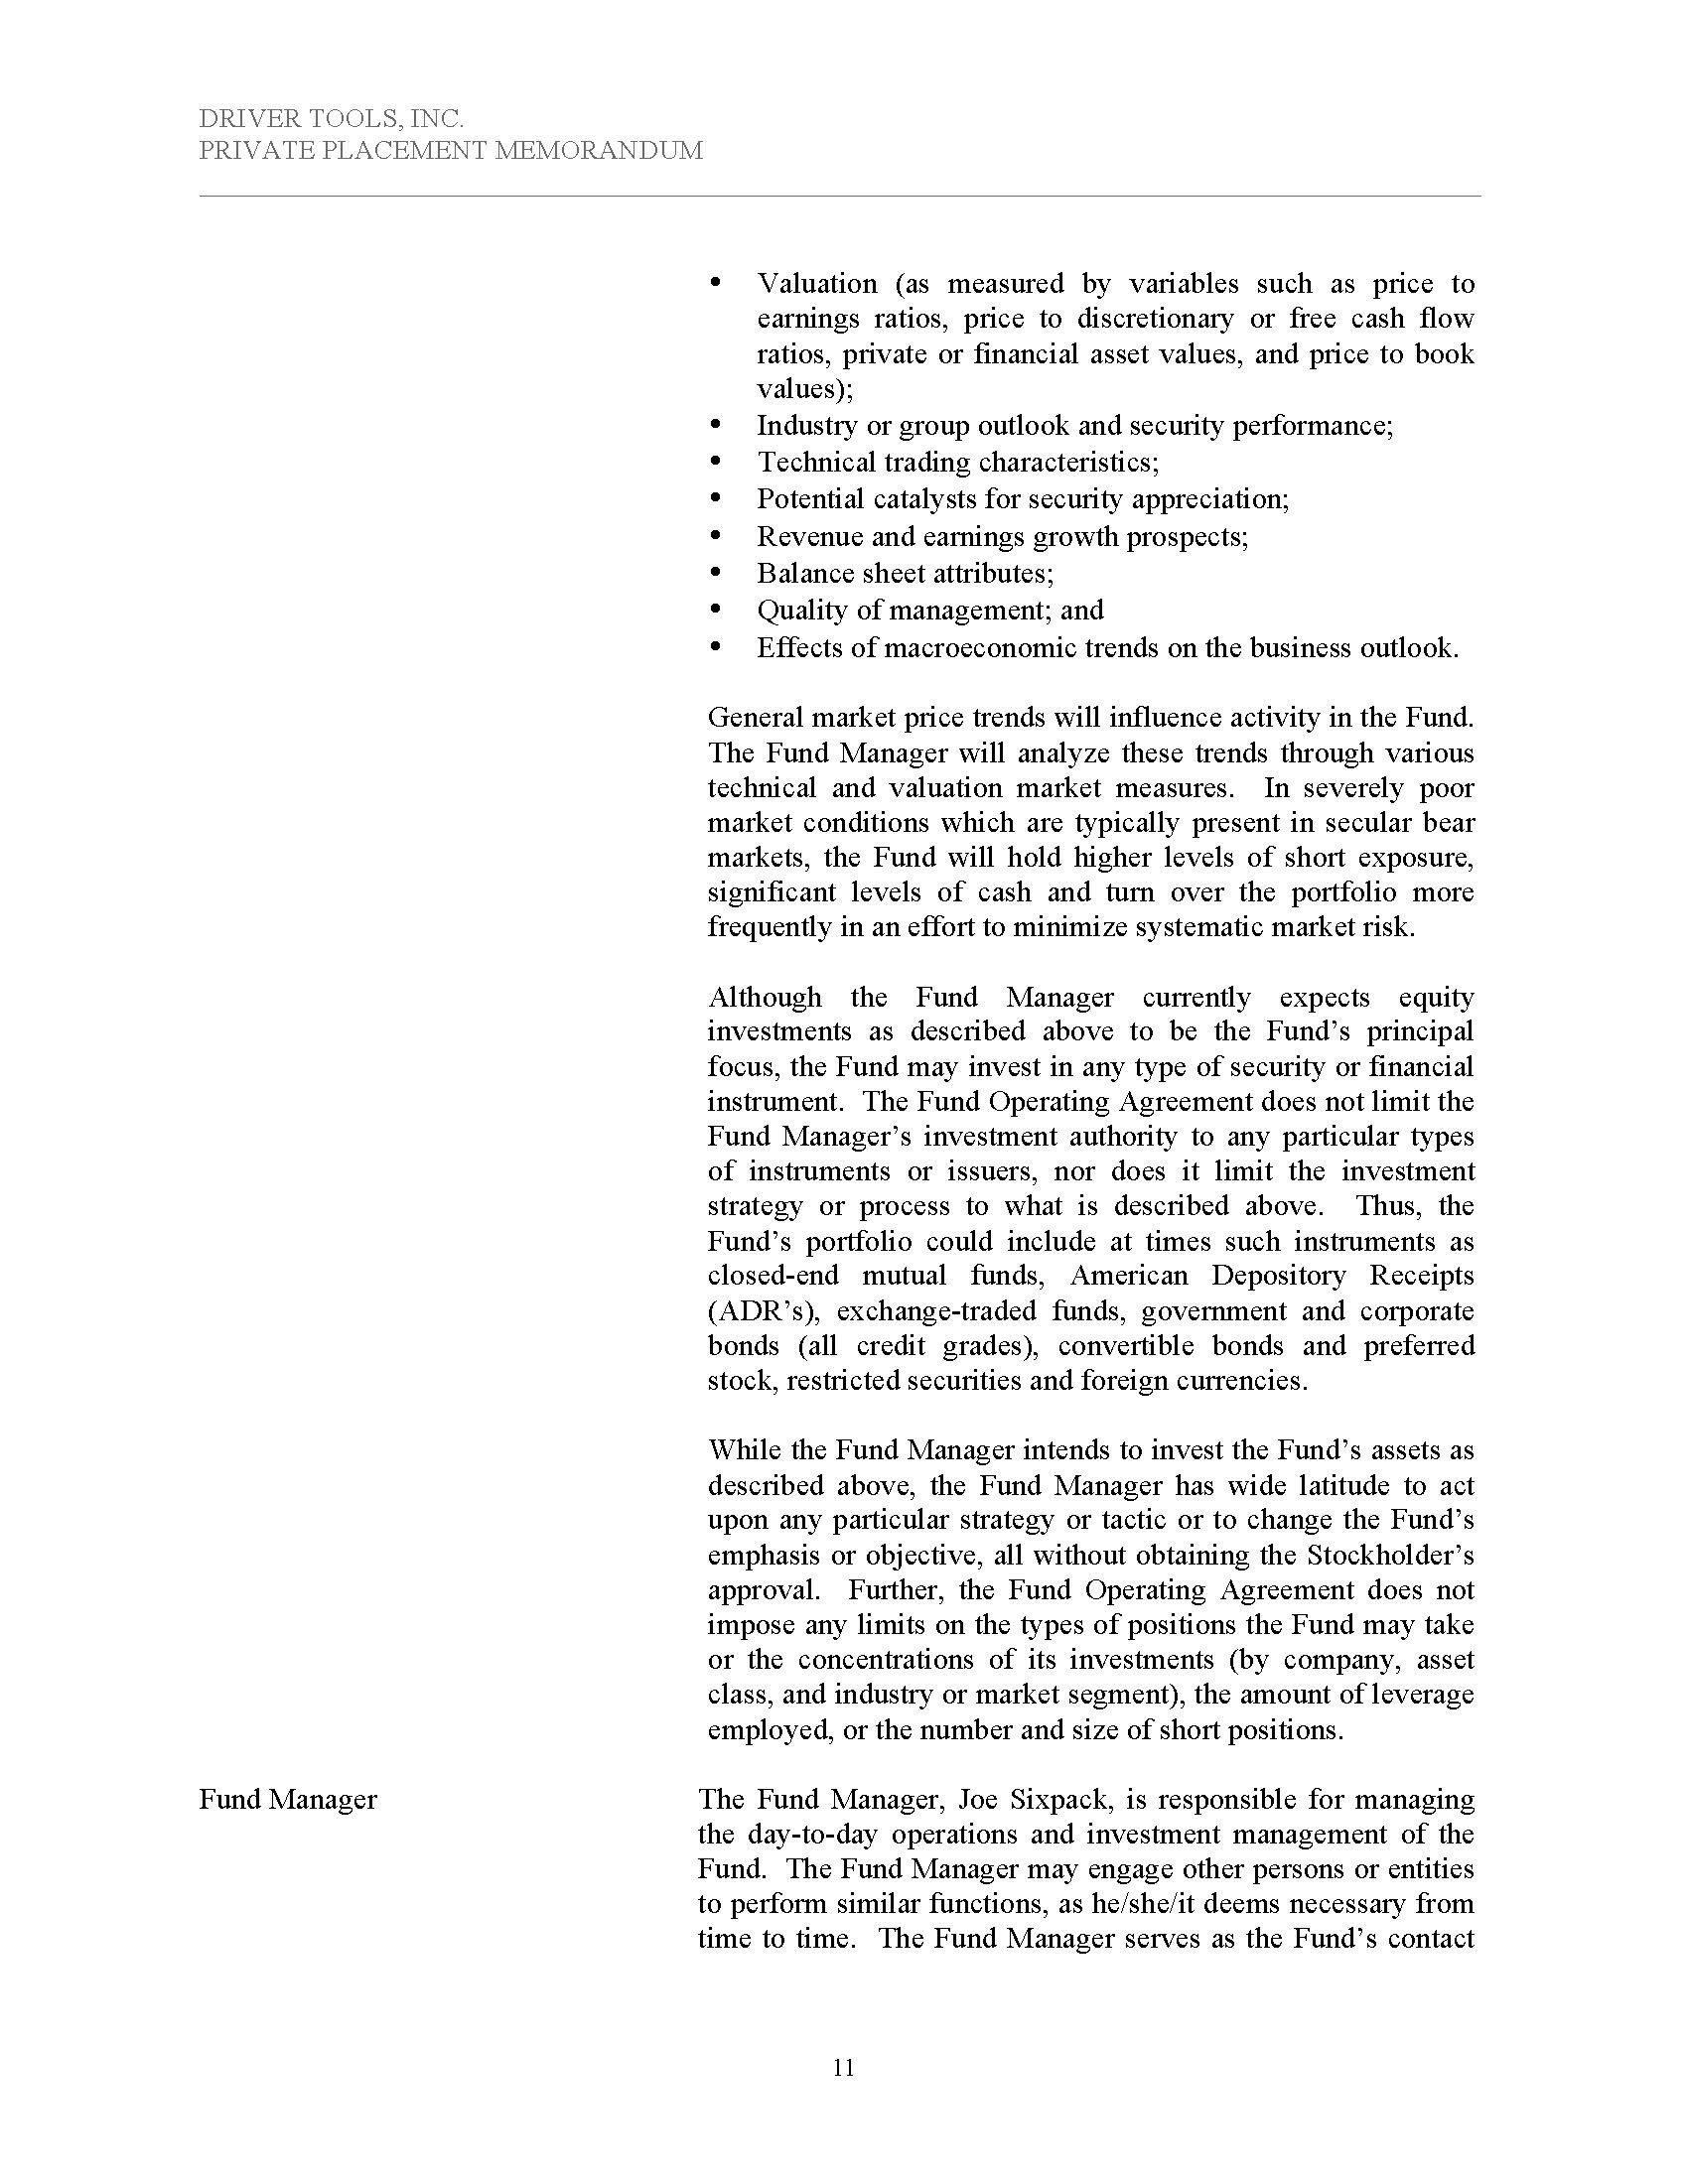 Rule 506(c) Corporate Hedge Fund